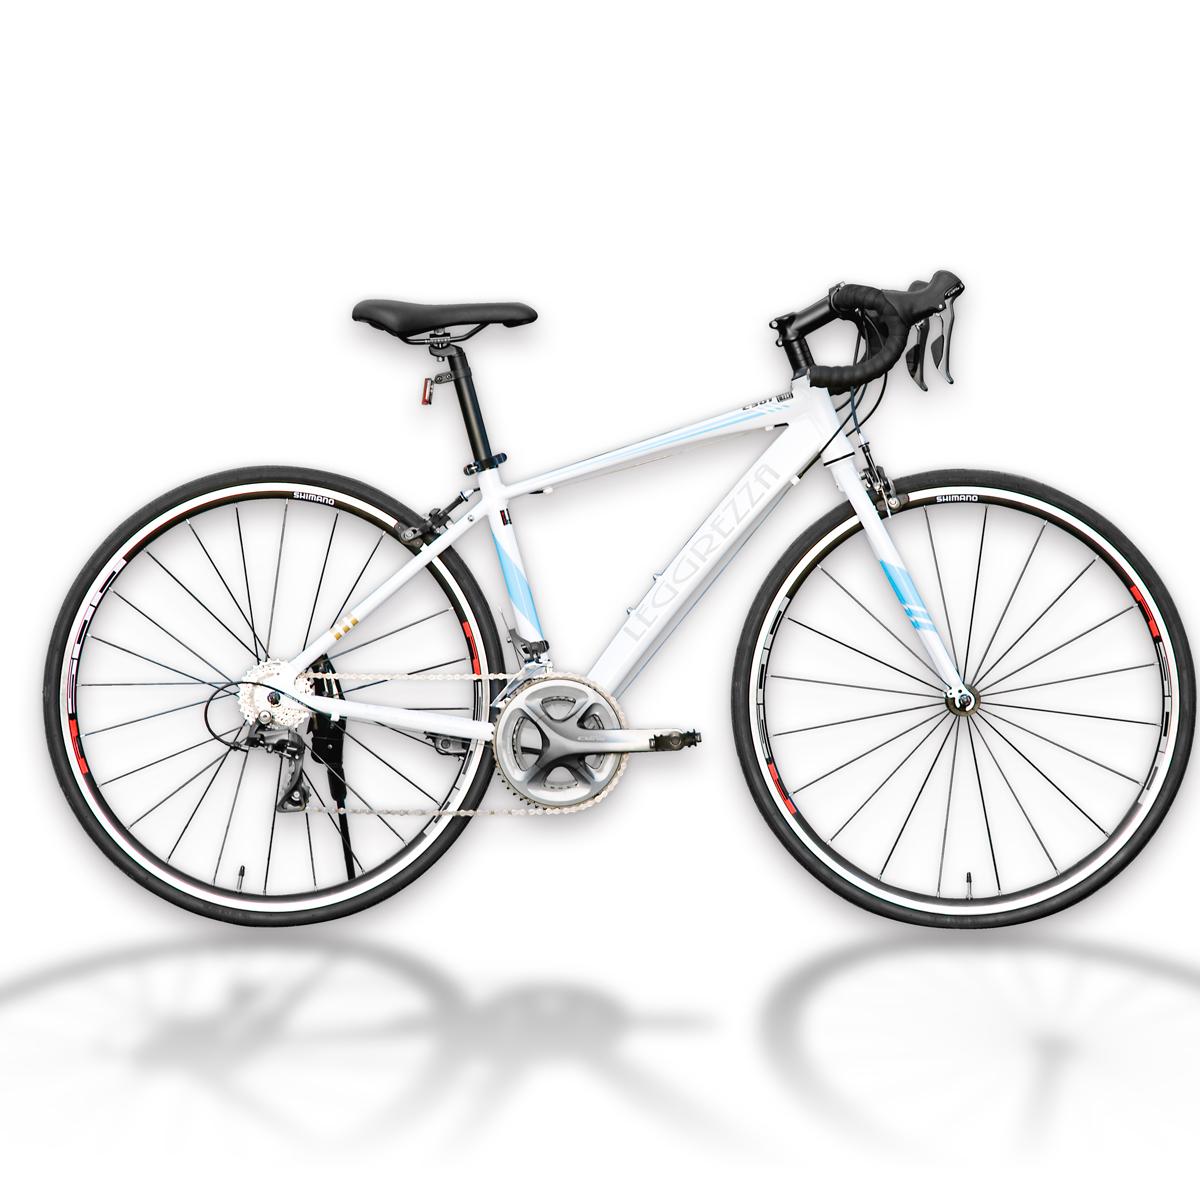 LEGGREZZA SPORTS/レグレッツァスポーツ 700C ロードレーサー C301R ホワイト(6501-C301R) ロードバイク 自転車本体